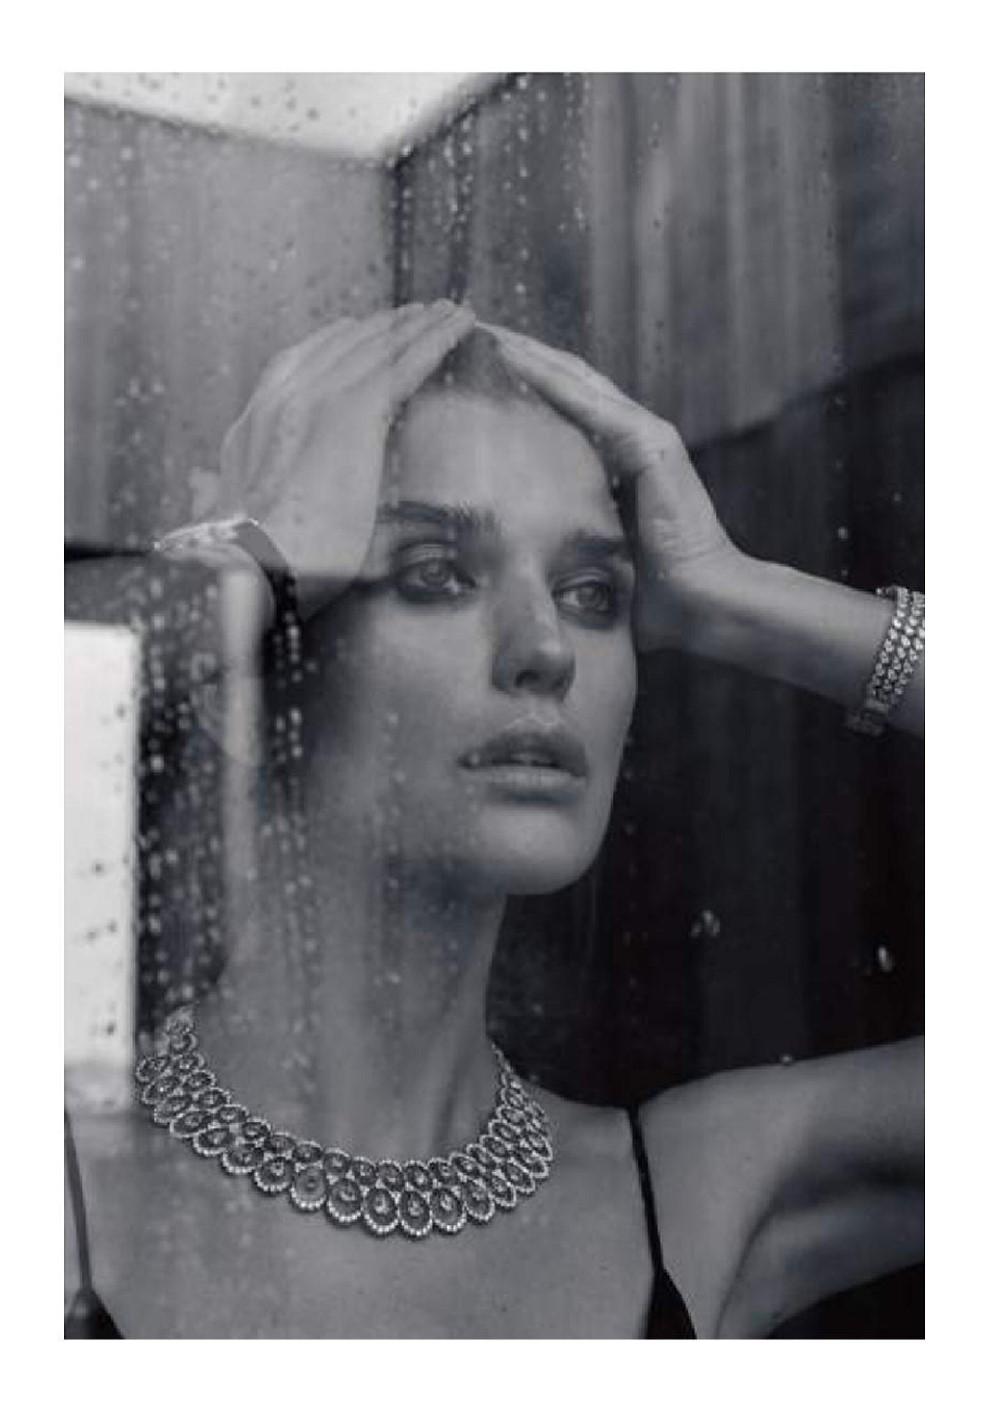 Nataliia Gotsii by Eric Panov for Harper's Bazaar Russia July 2019 (5).jpg